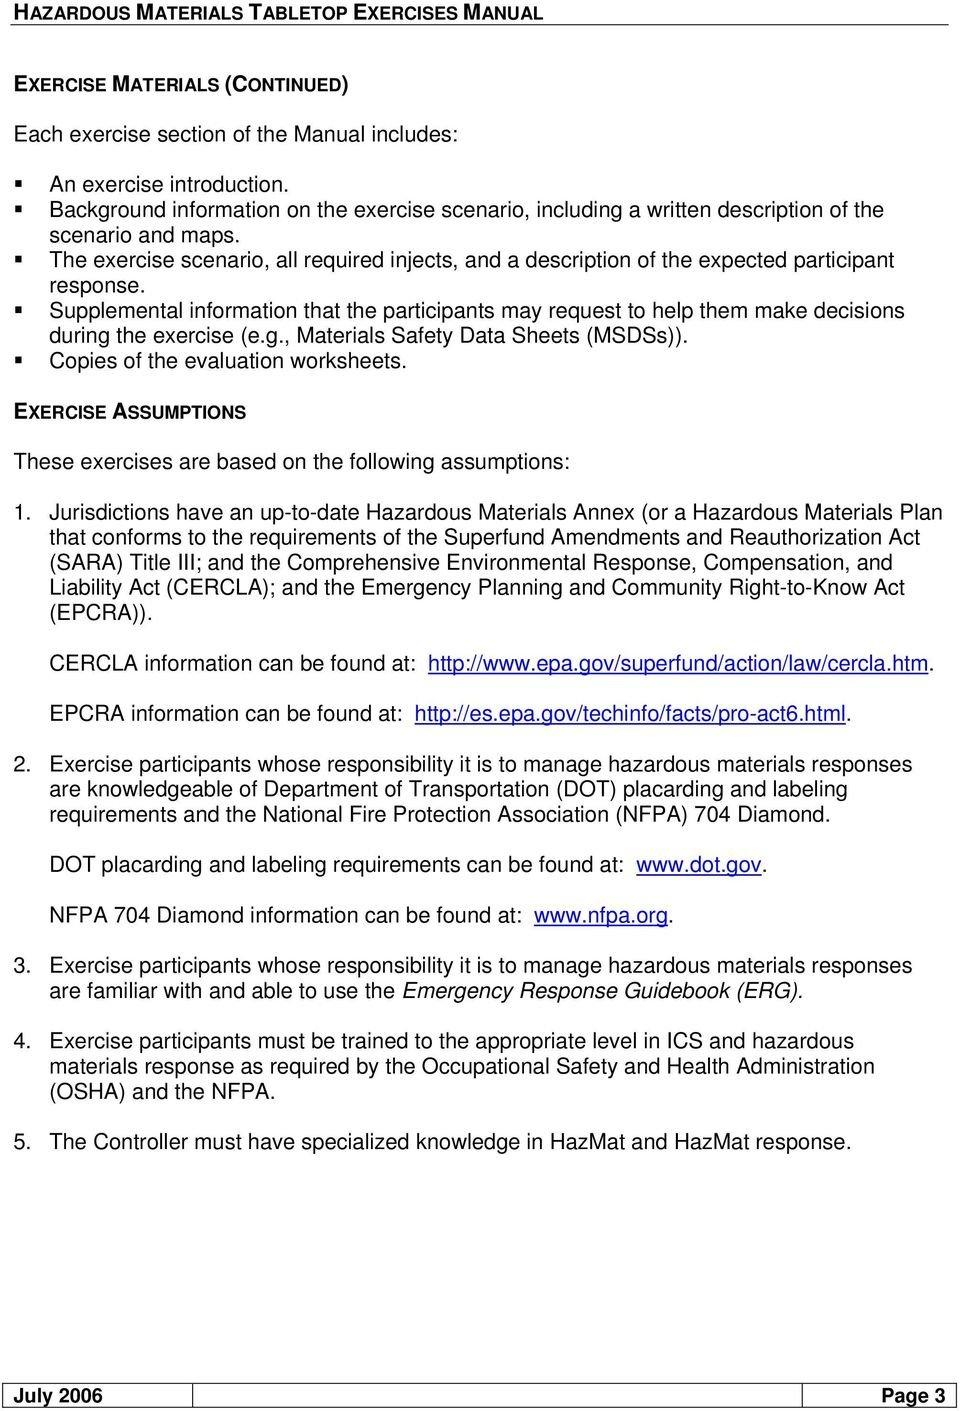 Hazardous Materials Tabletop Exercises Manual  Pdf Or Emergency Response Guidebook Worksheet